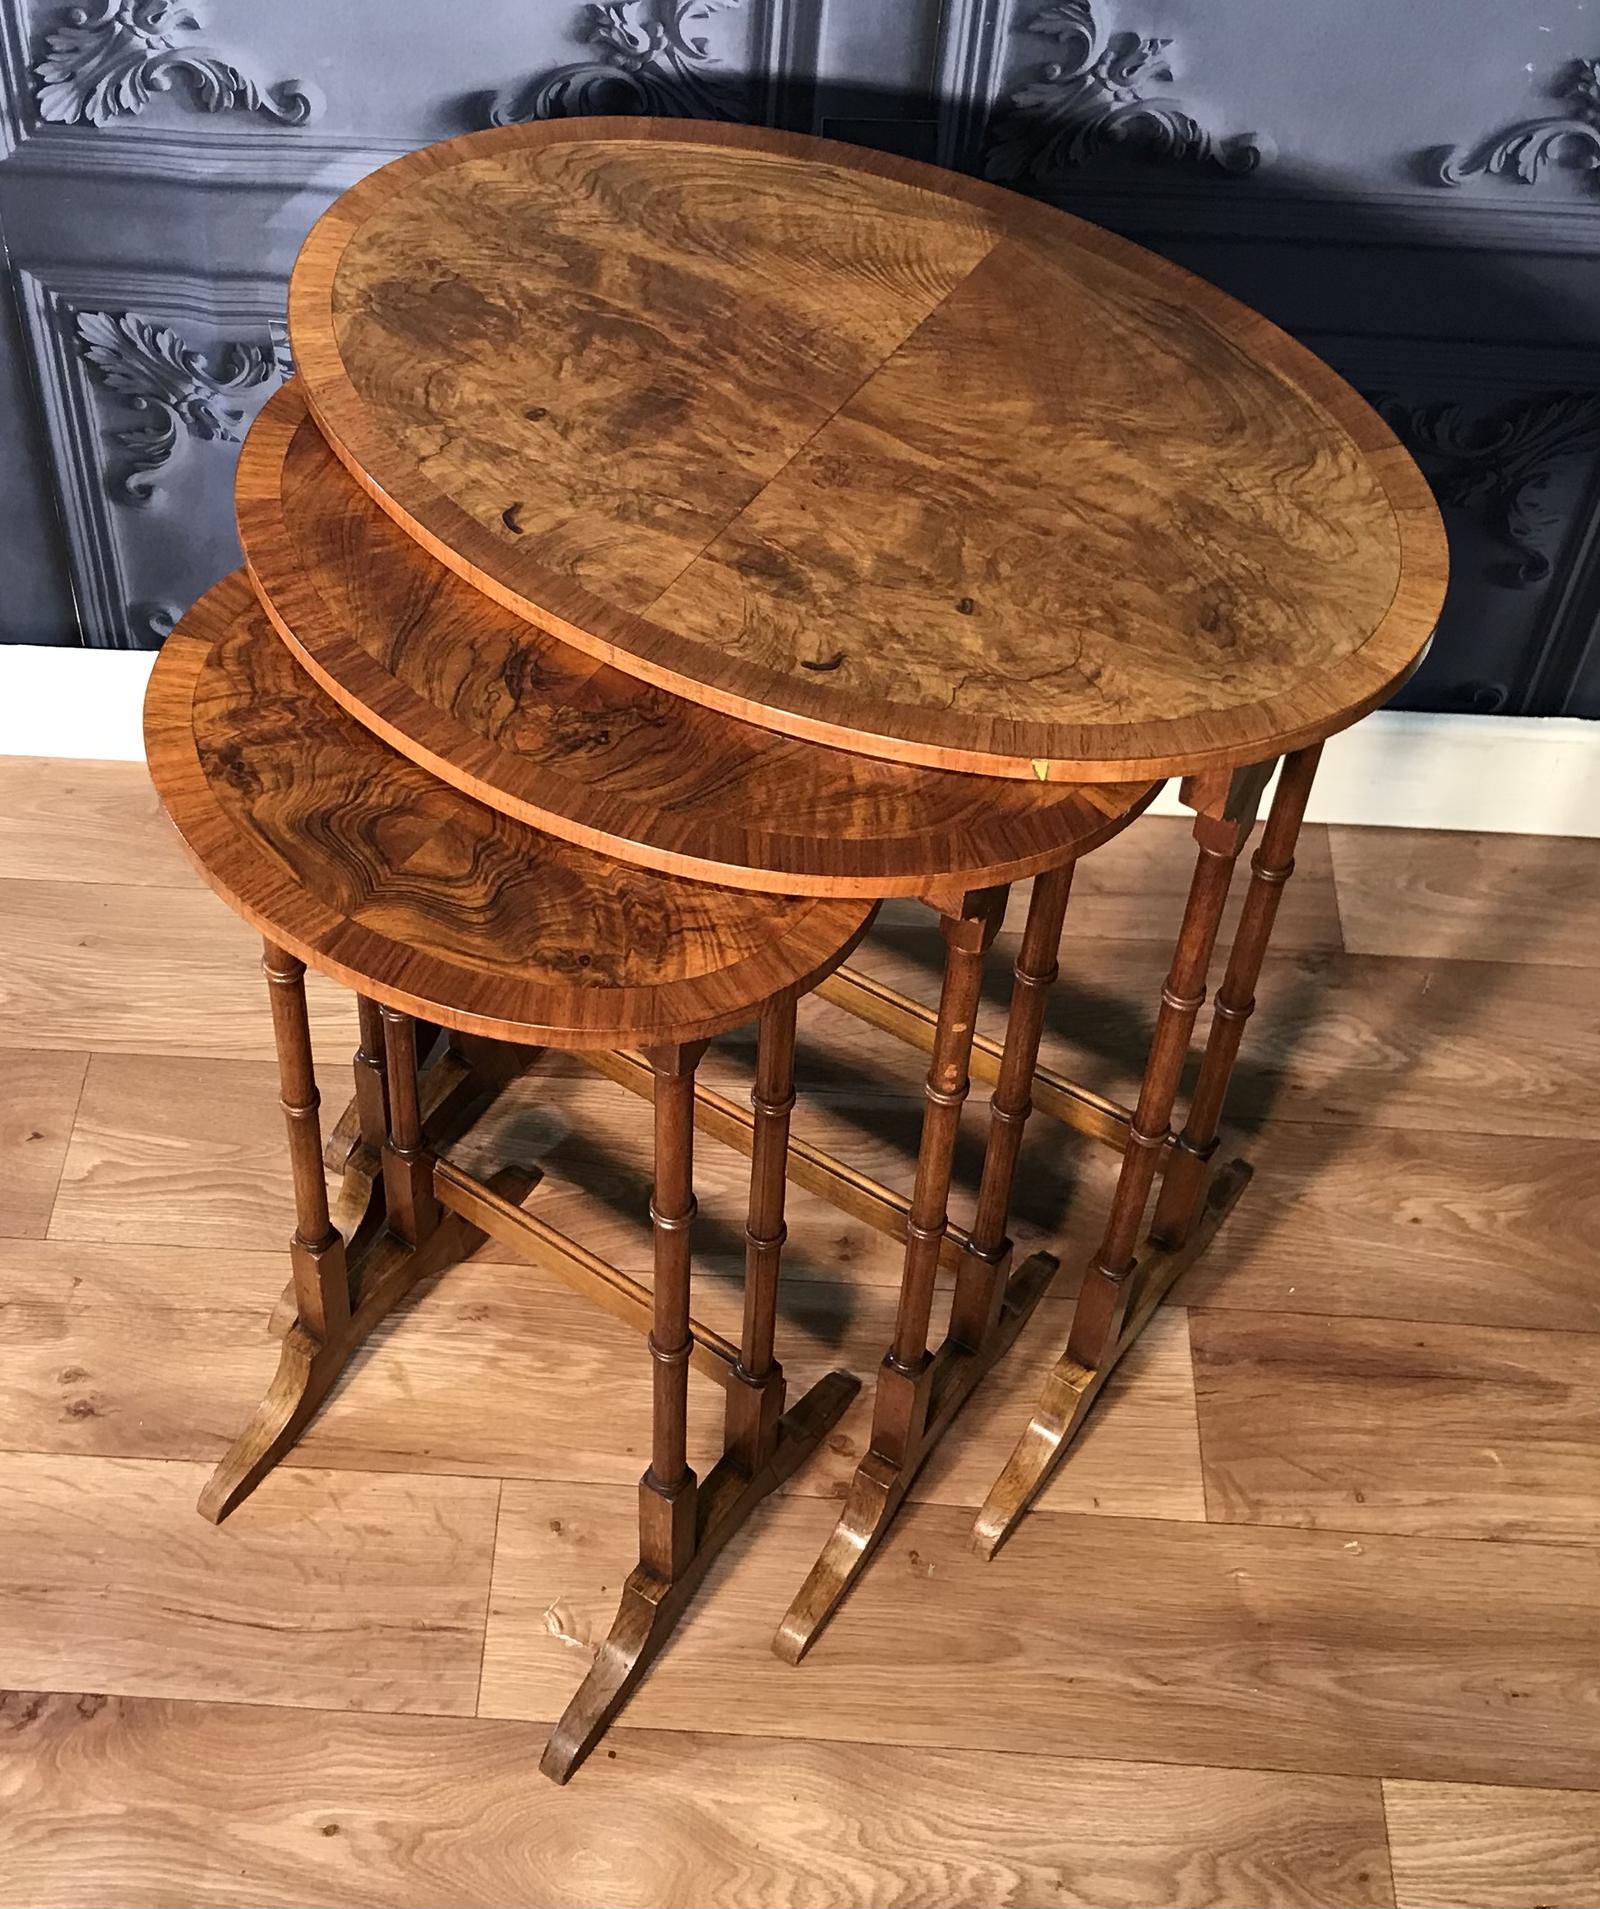 Burr Walnut Nest of Tables (1 of 1)